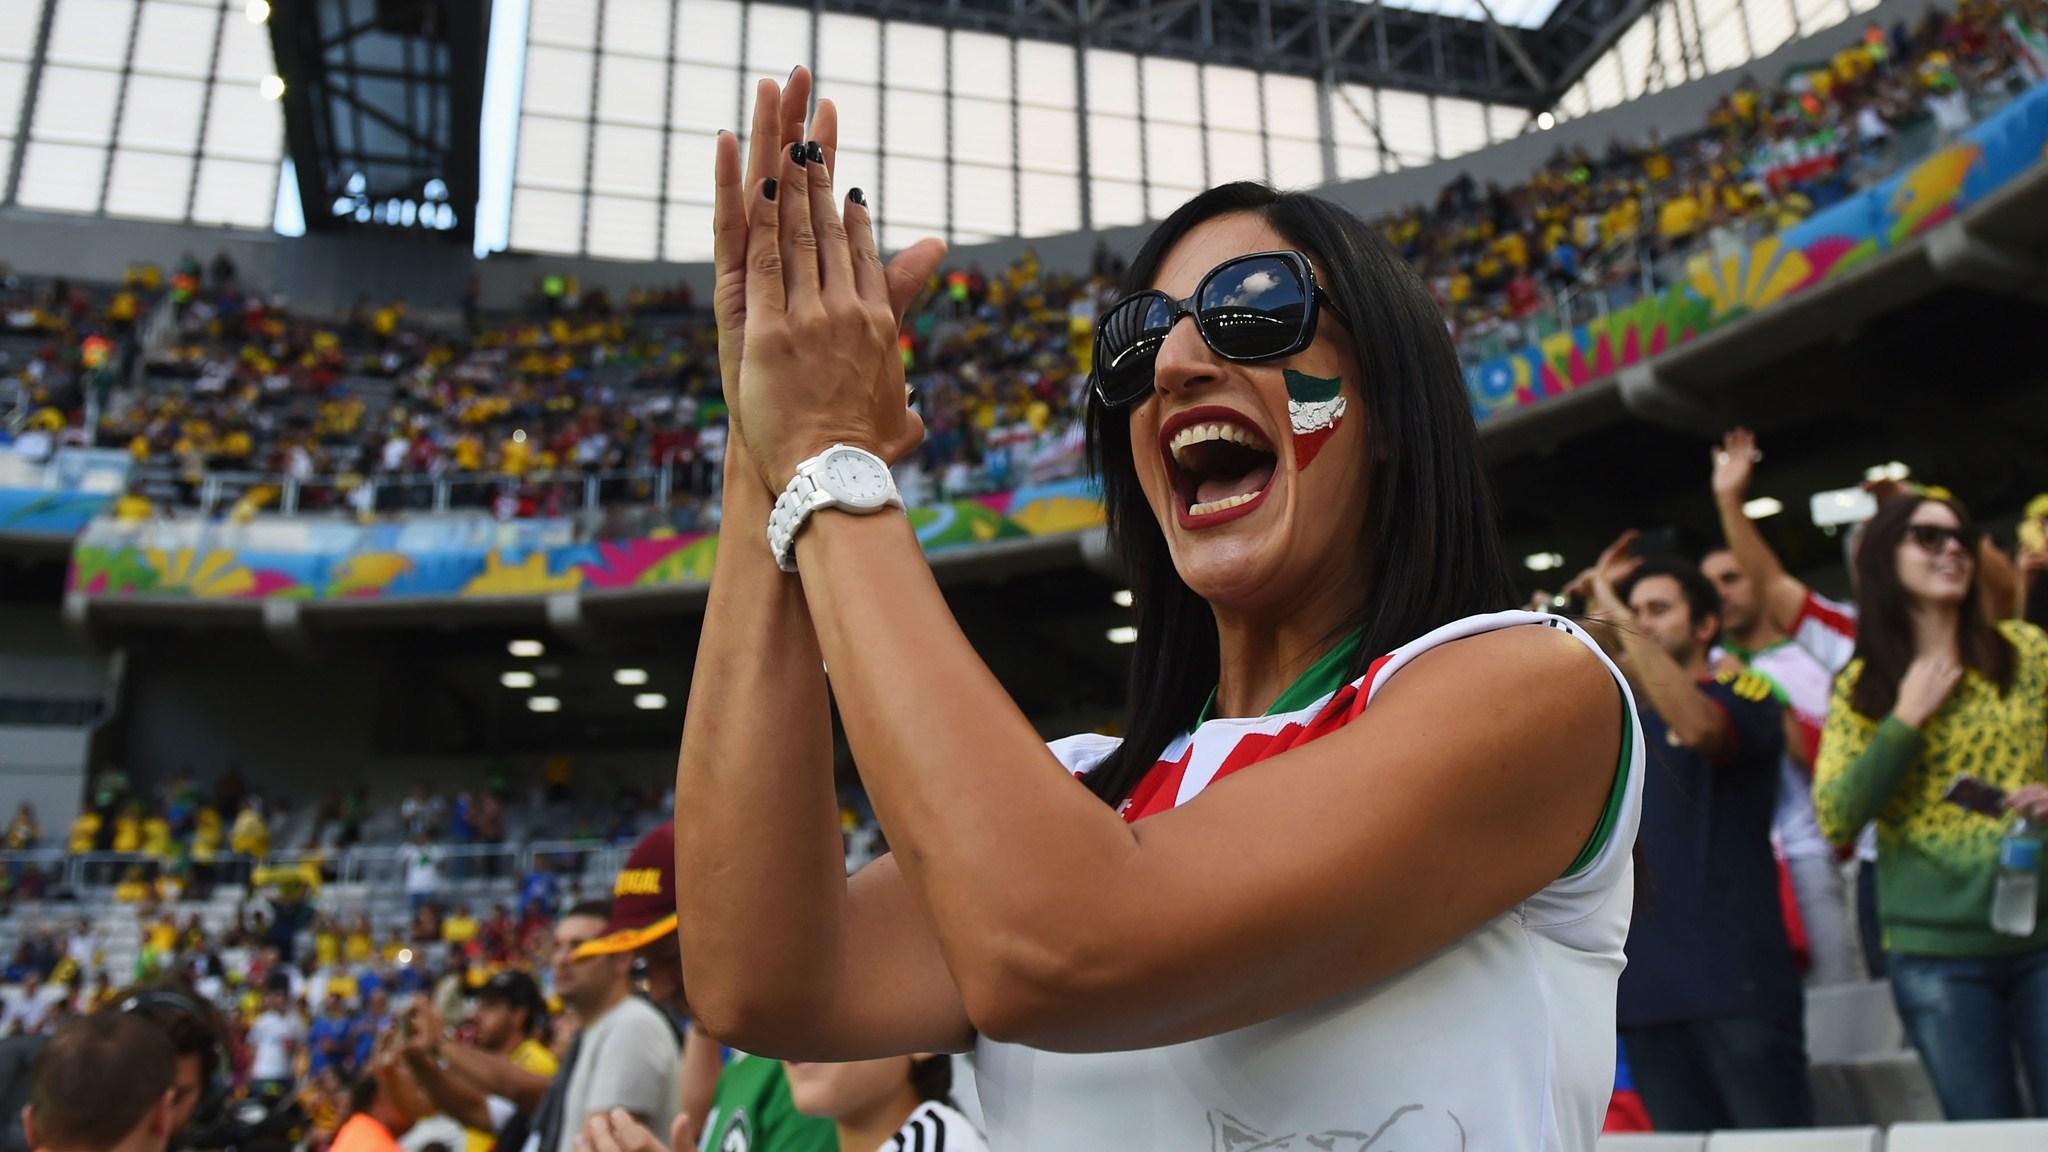 62 - Iran-Nigeria [0-0] -- 16 Jun 2014 - 16-00 -- Curitiba - Arena da Baixada - kuaza